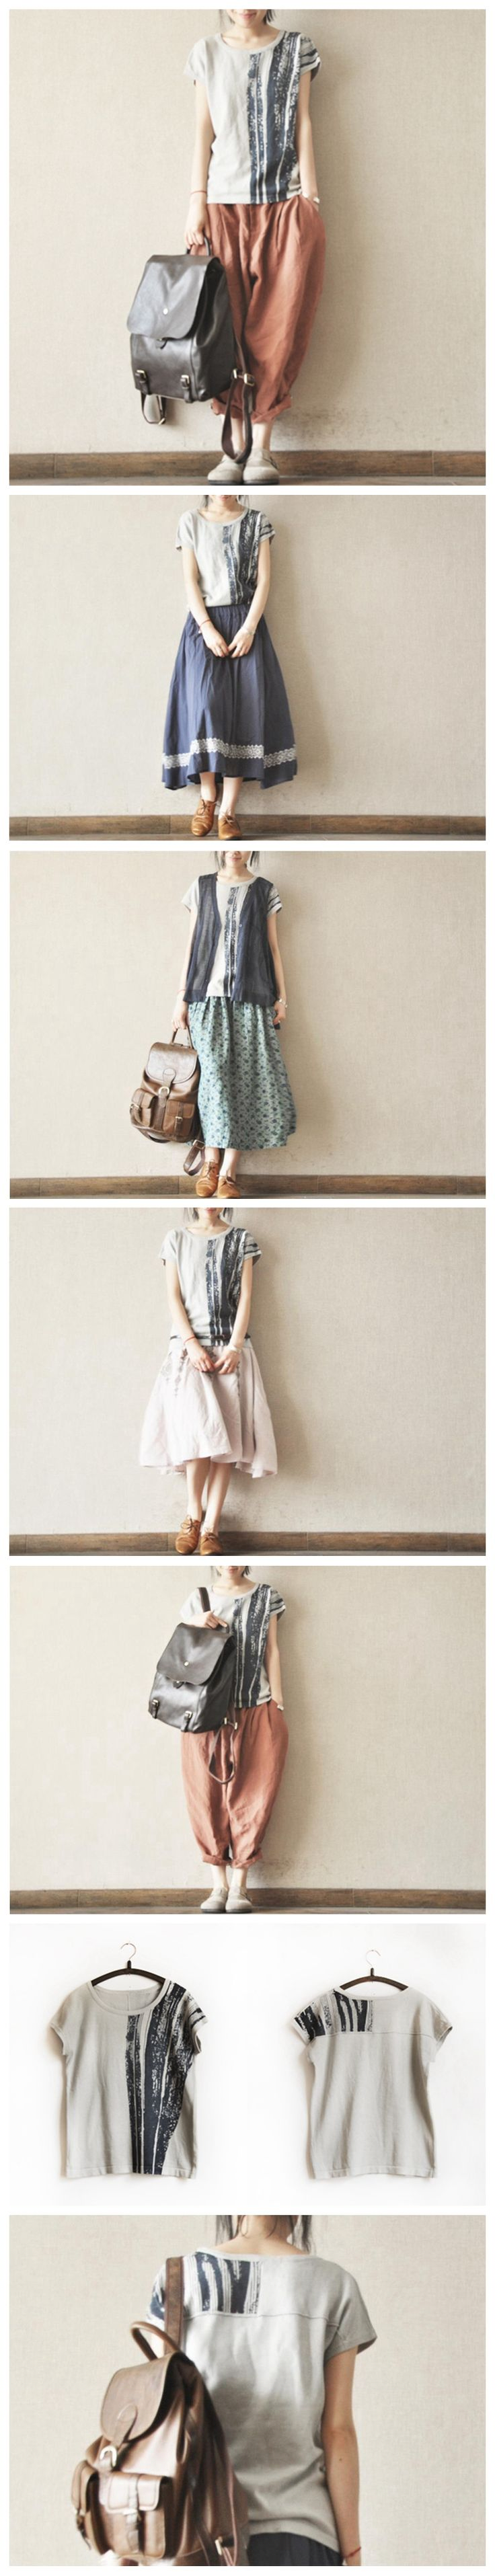 Grey Ink T-shirt Knitwear Cotton Top Summer Blouse Women Clothes by Fantasylinen